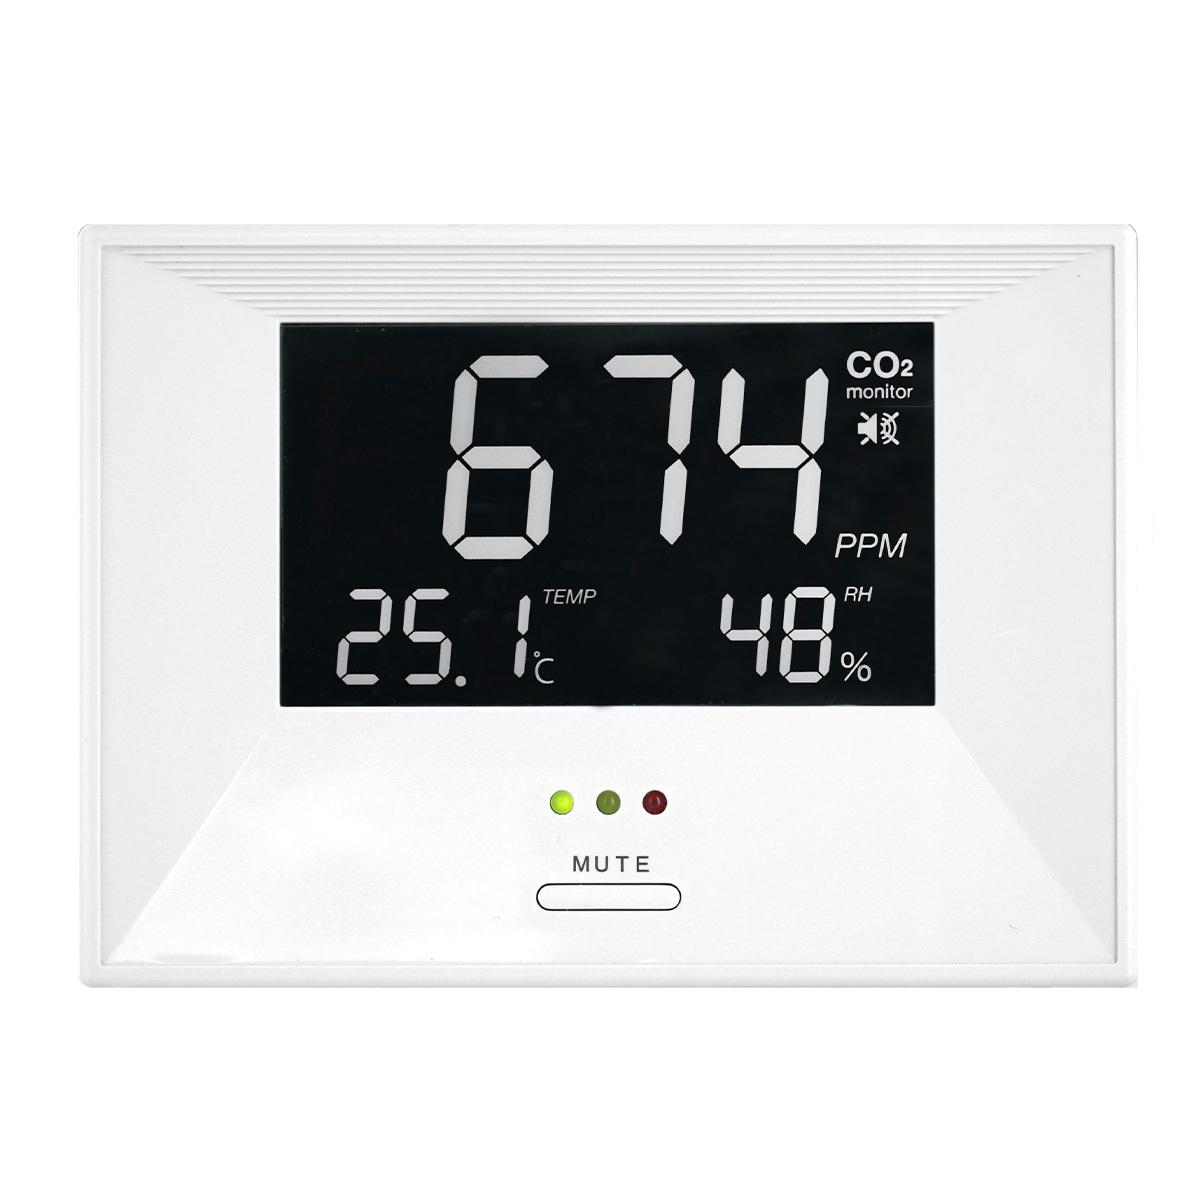 31-5003-co2-monitor-airco2ntrol-life-1200x1200px.jpg